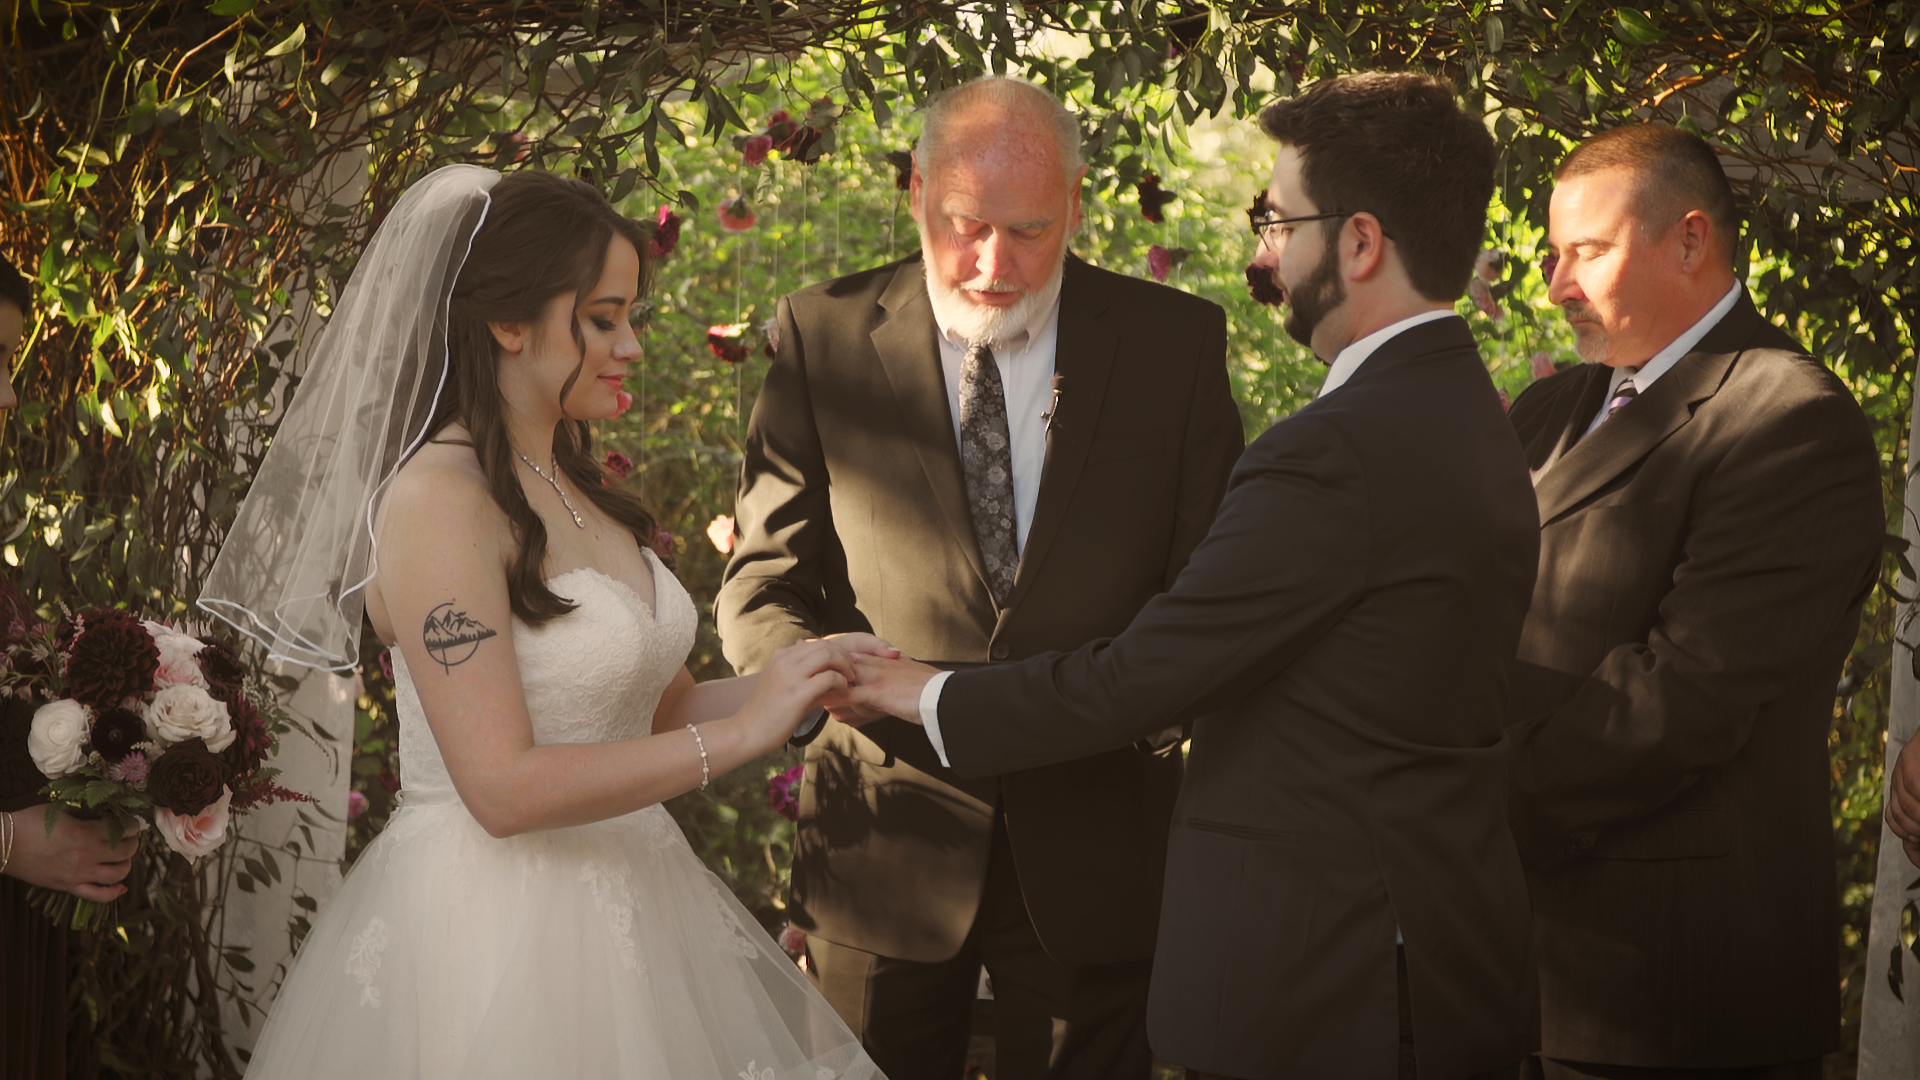 Rebecca_and_Daniel_Wedding_Austin_Texas_Vista_West_Ranch13.png